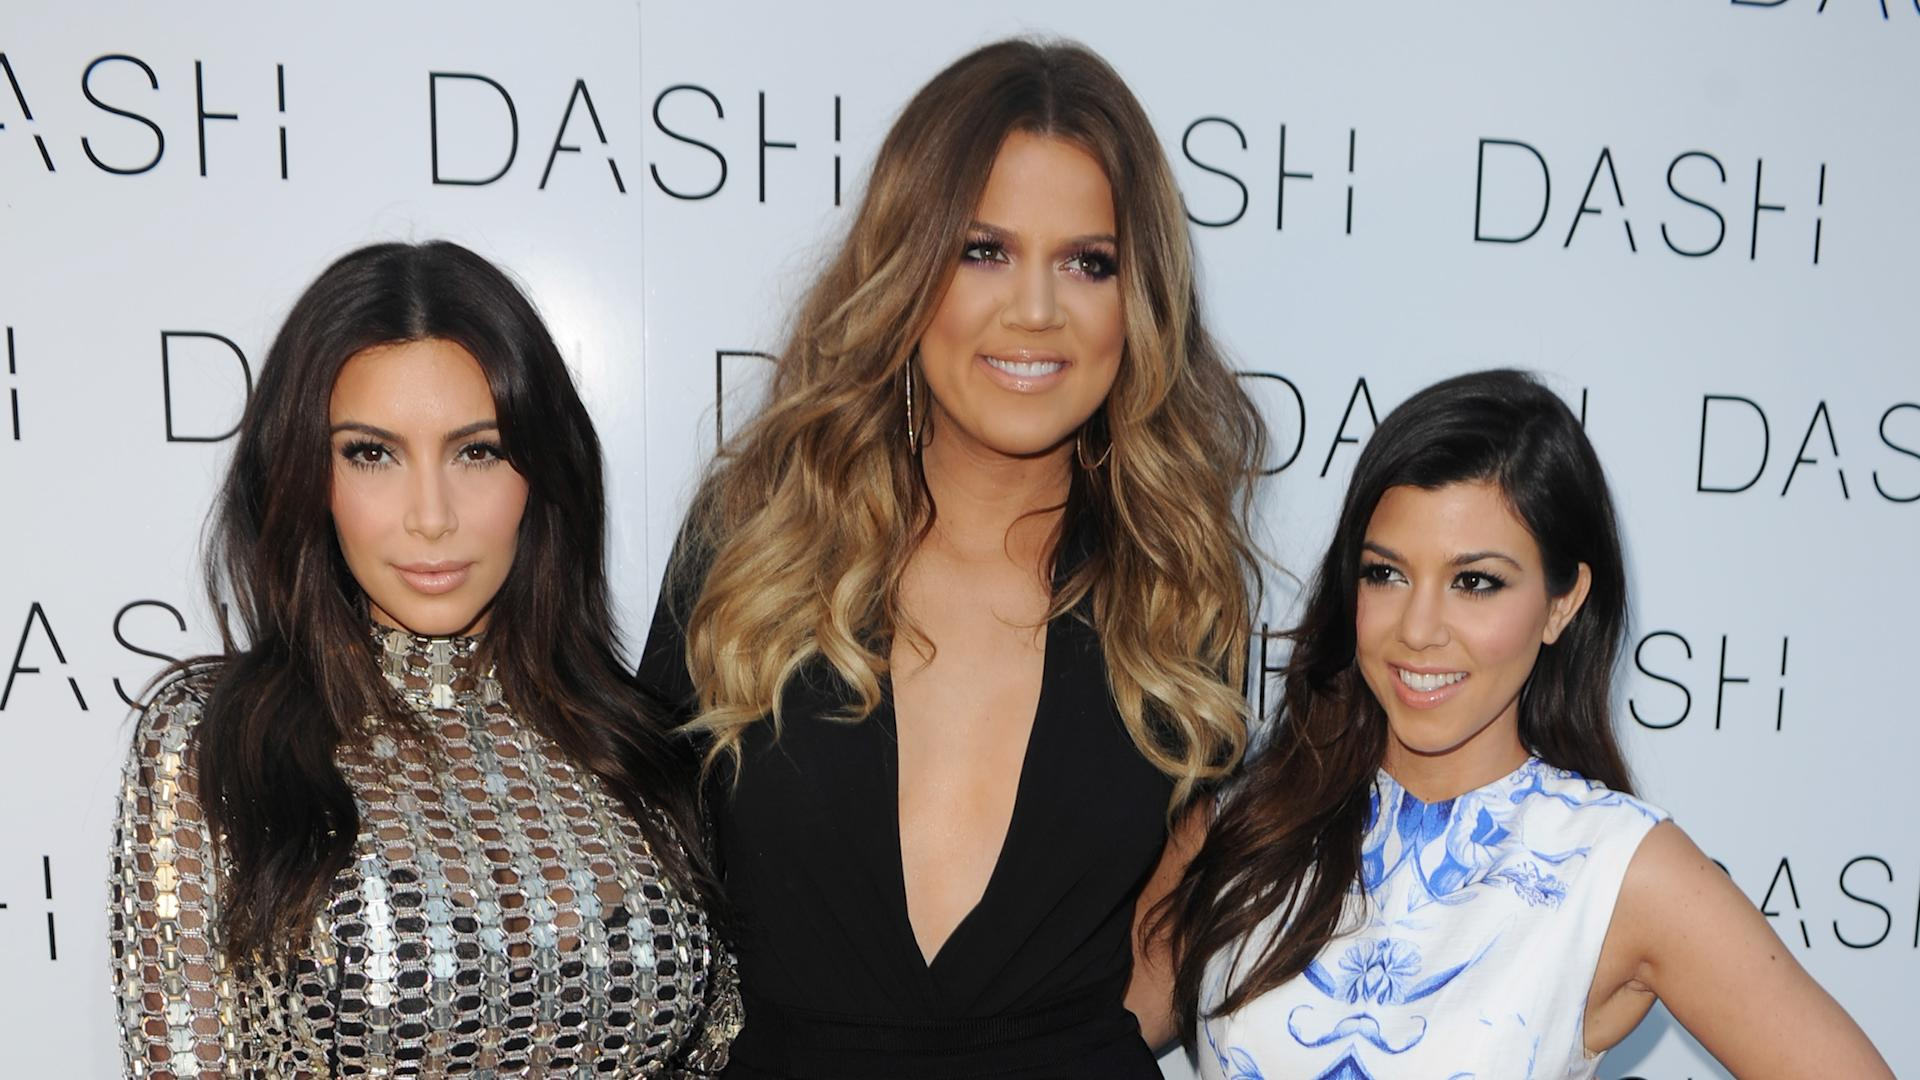 c2f4163b62b9 Kourtney Kardashian Spars With Kim and Khloe While Live-Tweeting 'KUWTK'  Premiere